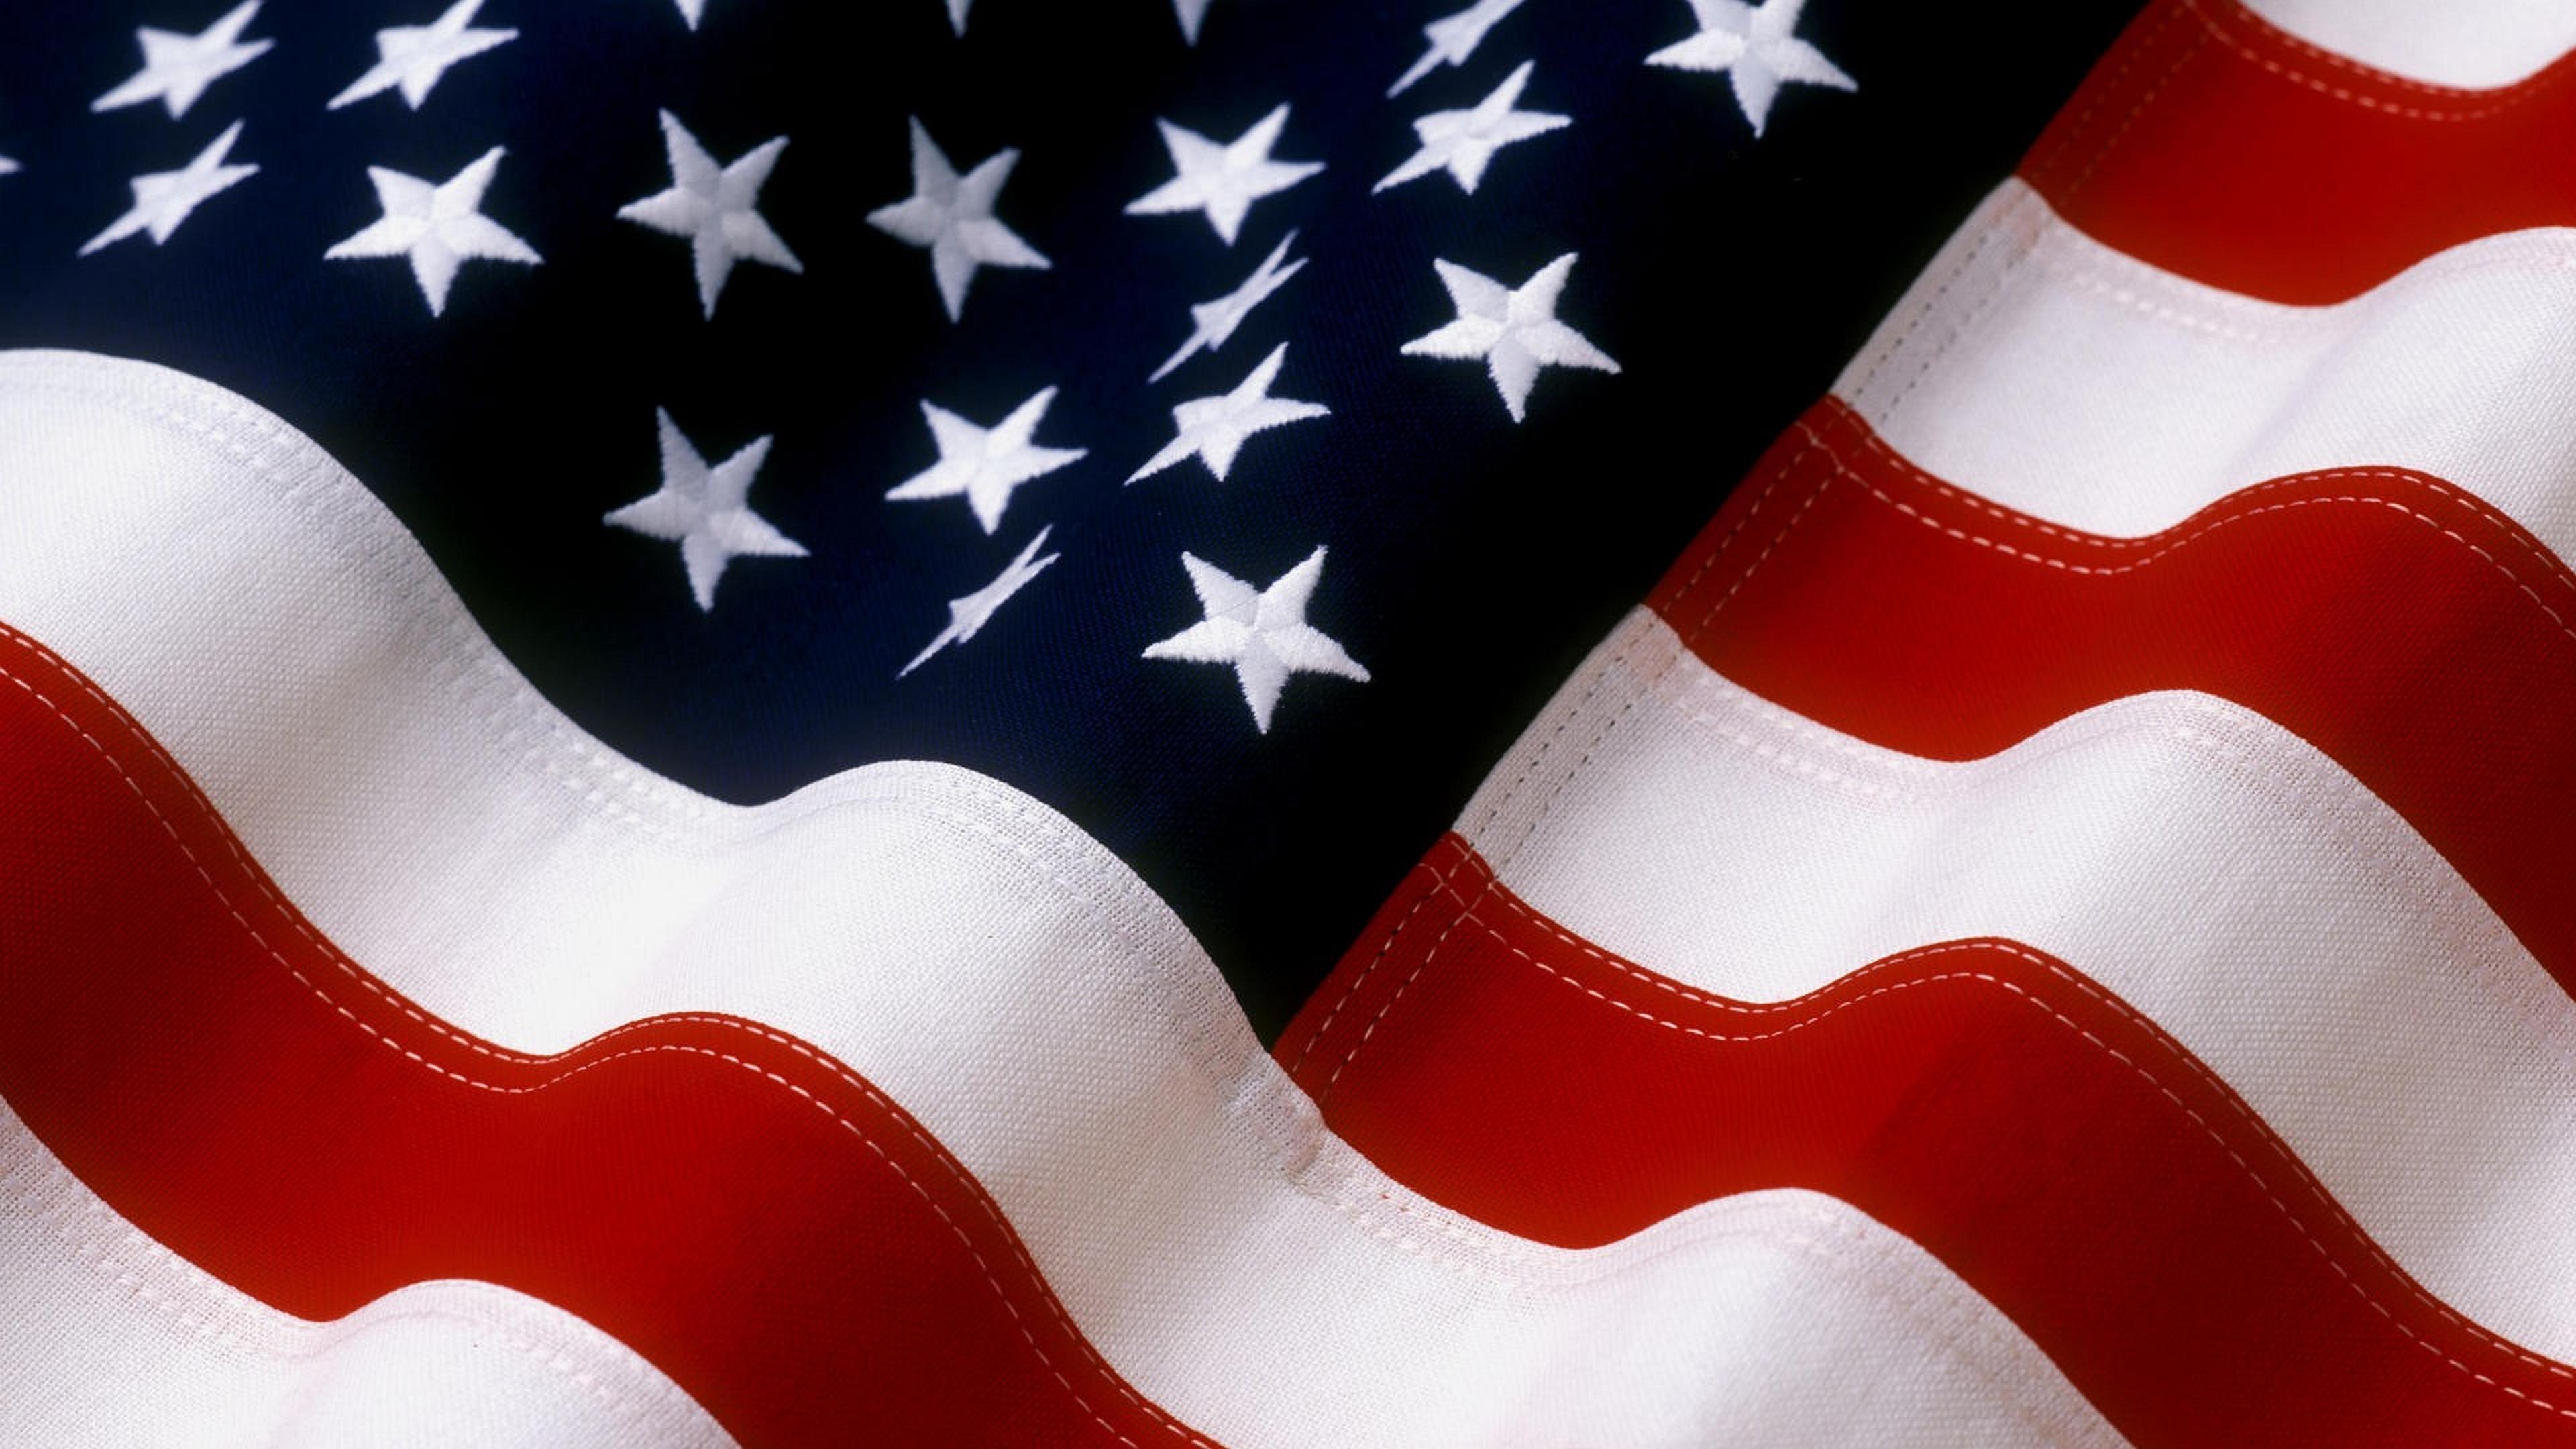 Thin Blue Line American Flag American flag wallpaper phonejpg 3840x2160